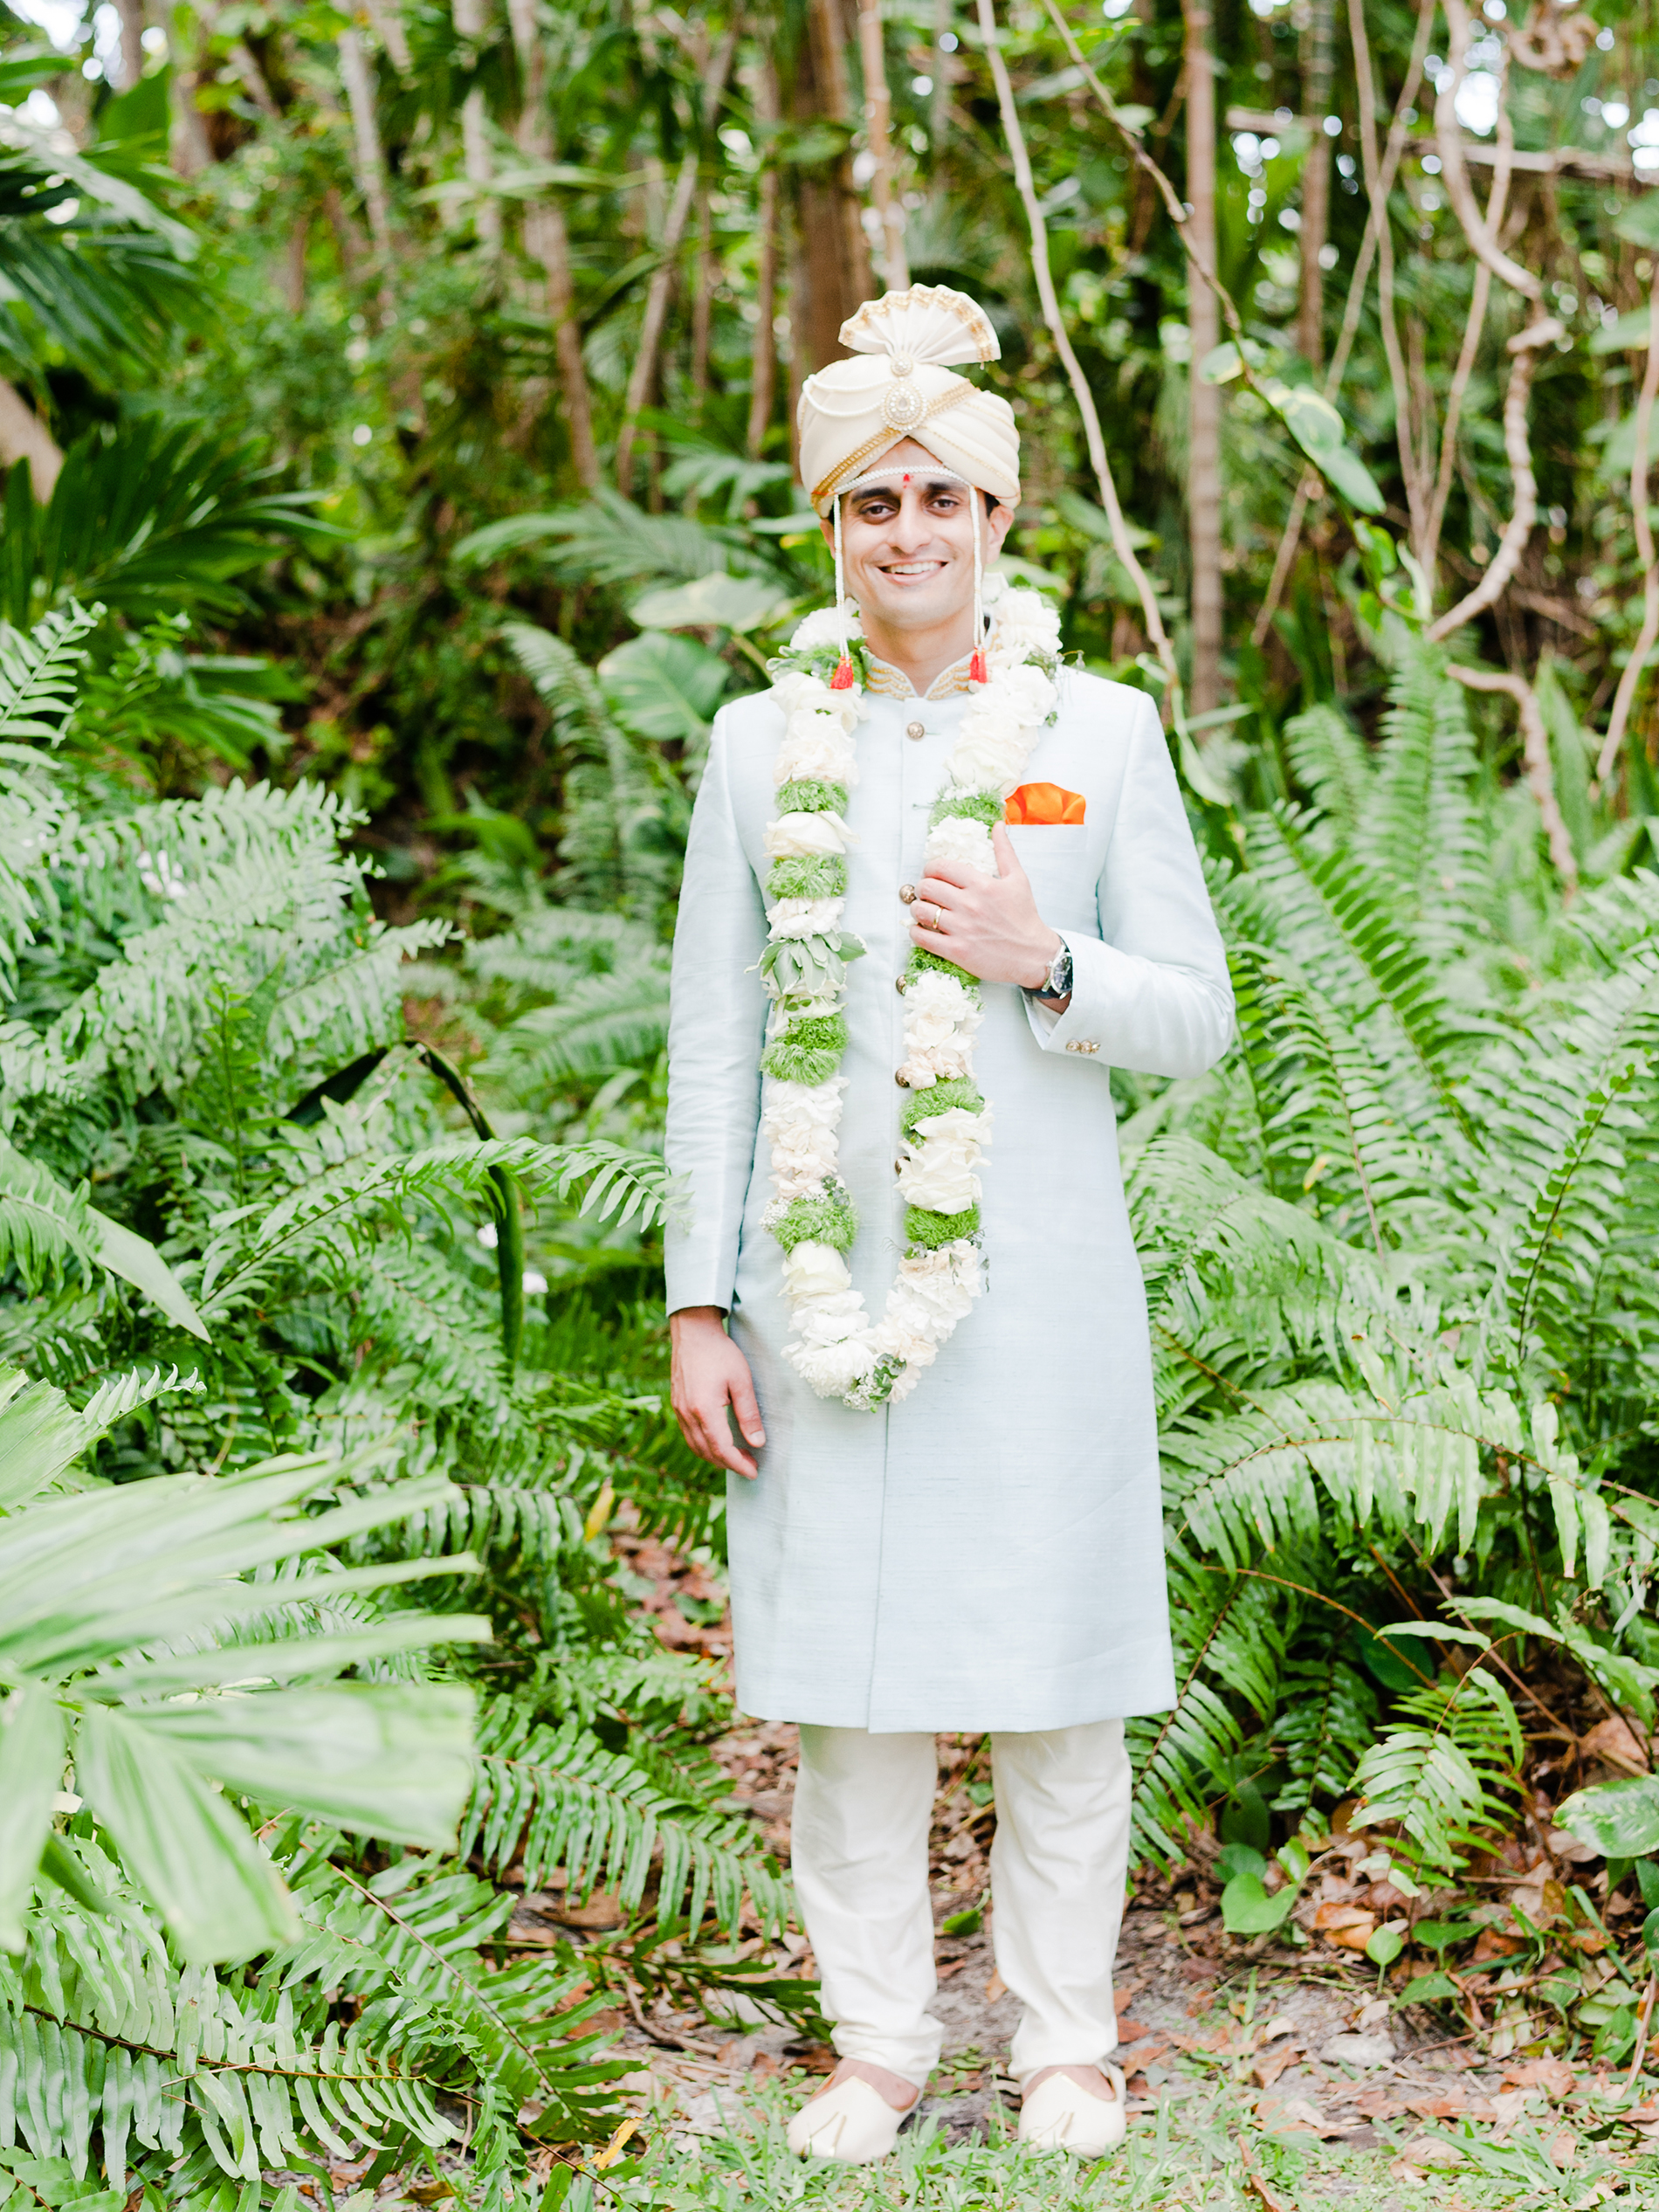 anuja nikhil wedding groom ferns palms